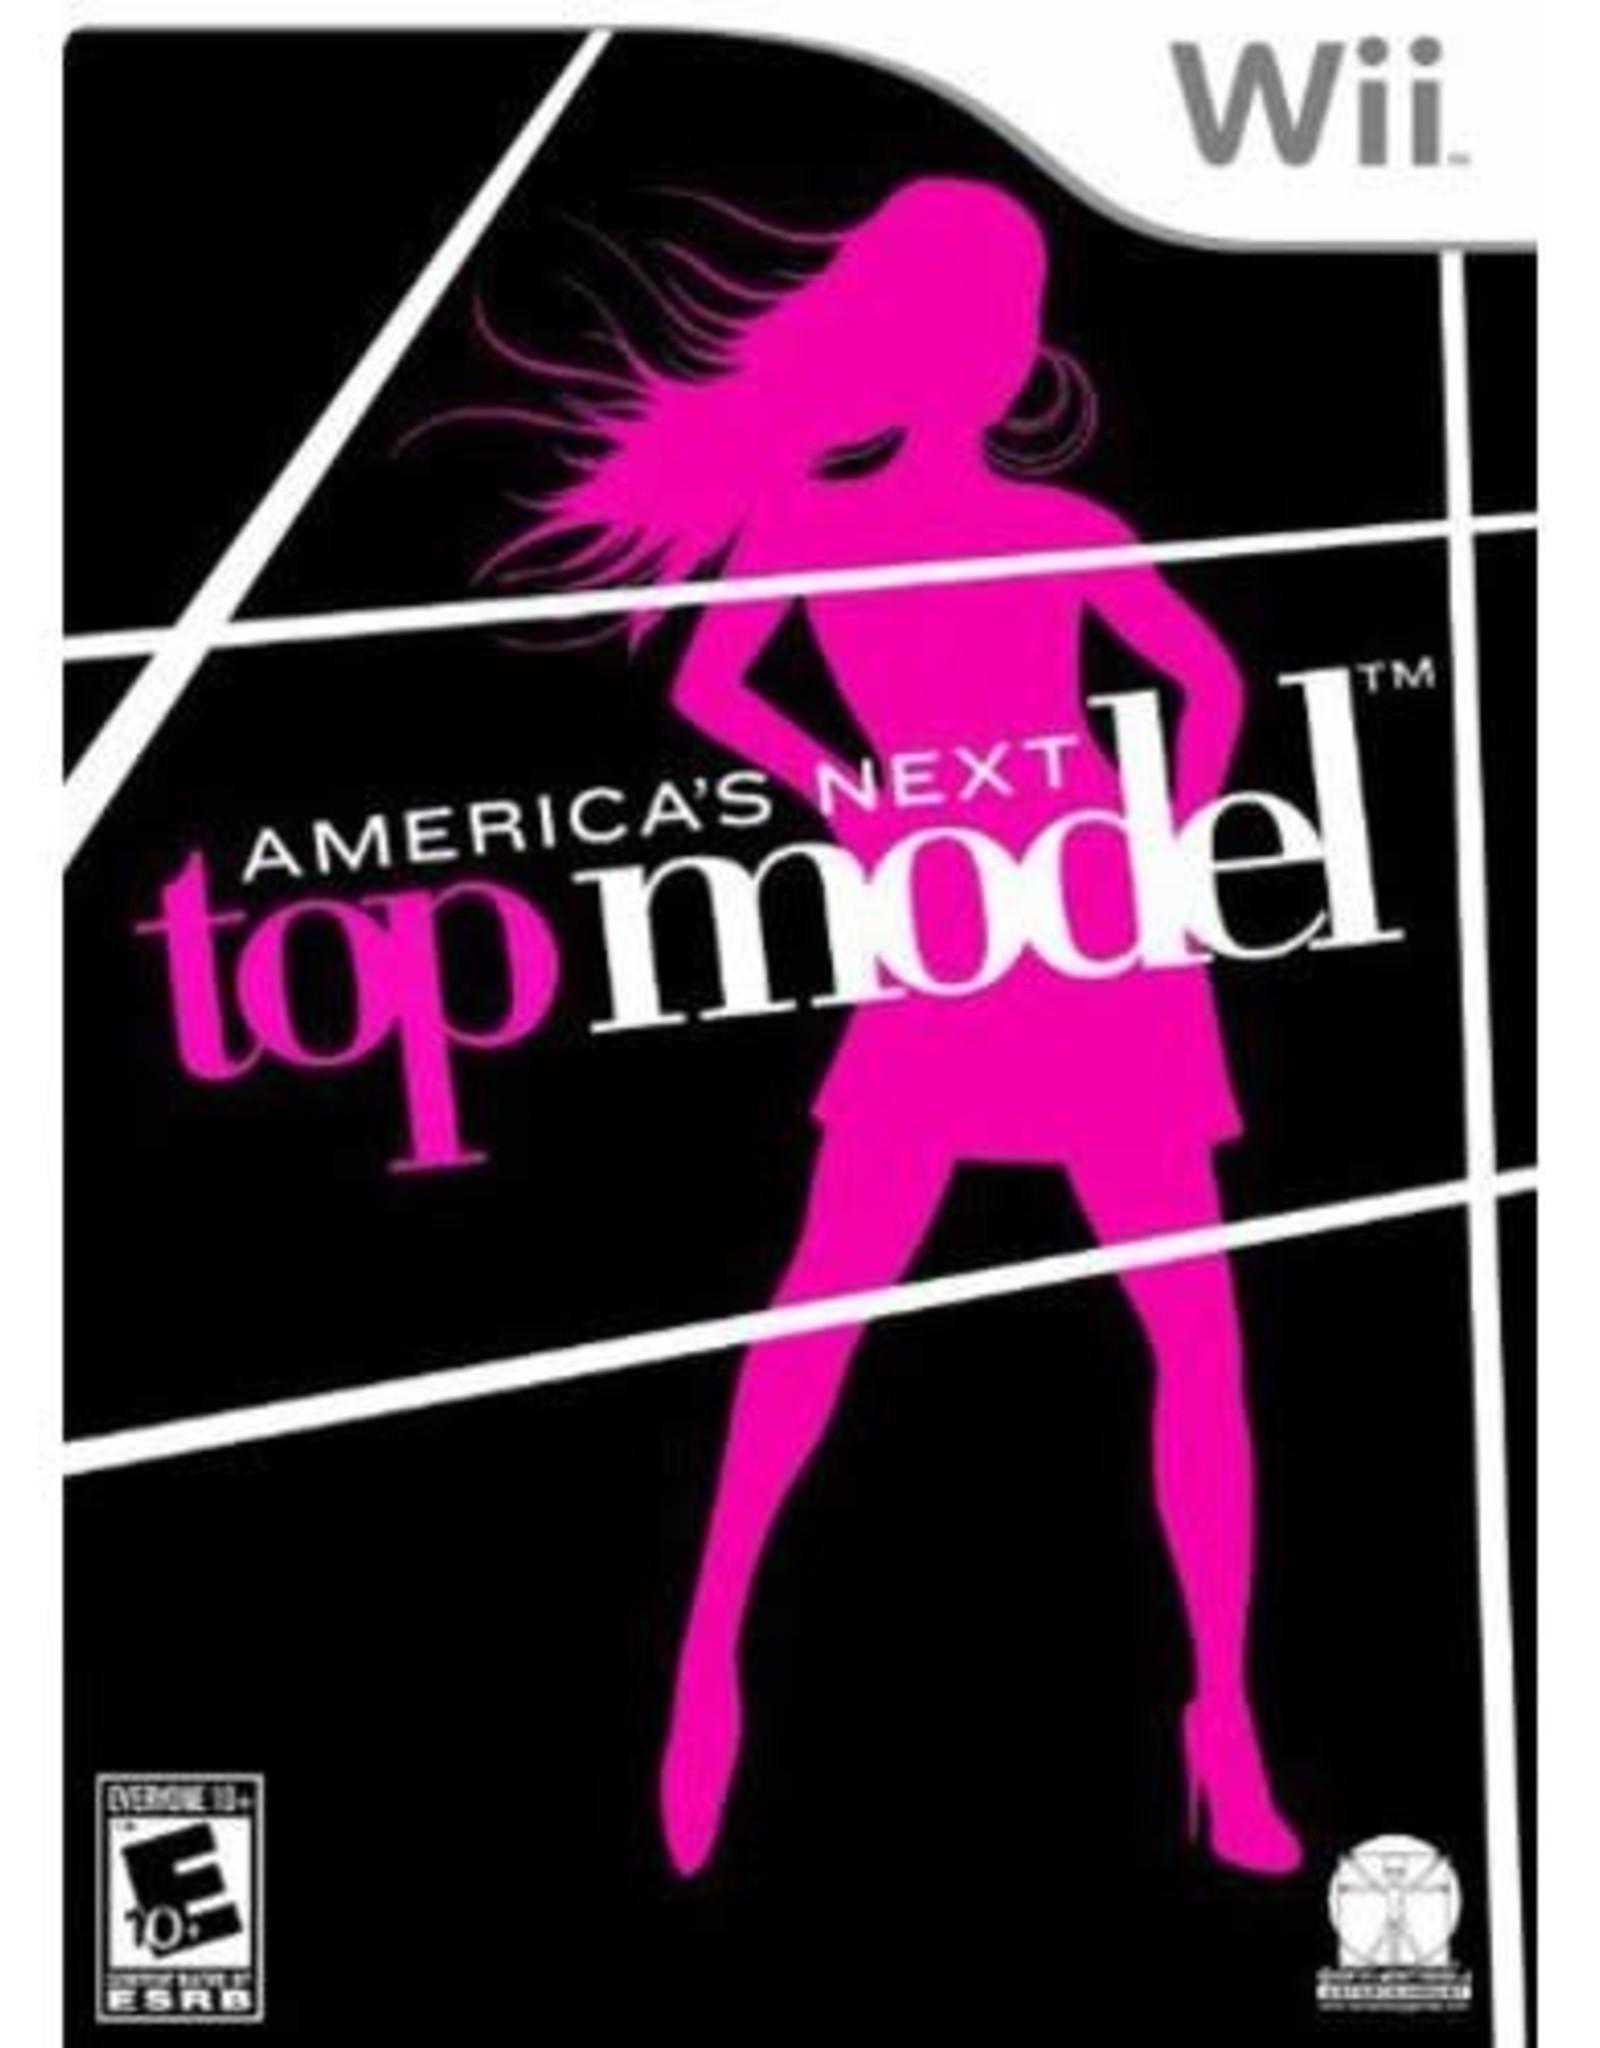 America's Next Top Model - Wii Preplayed